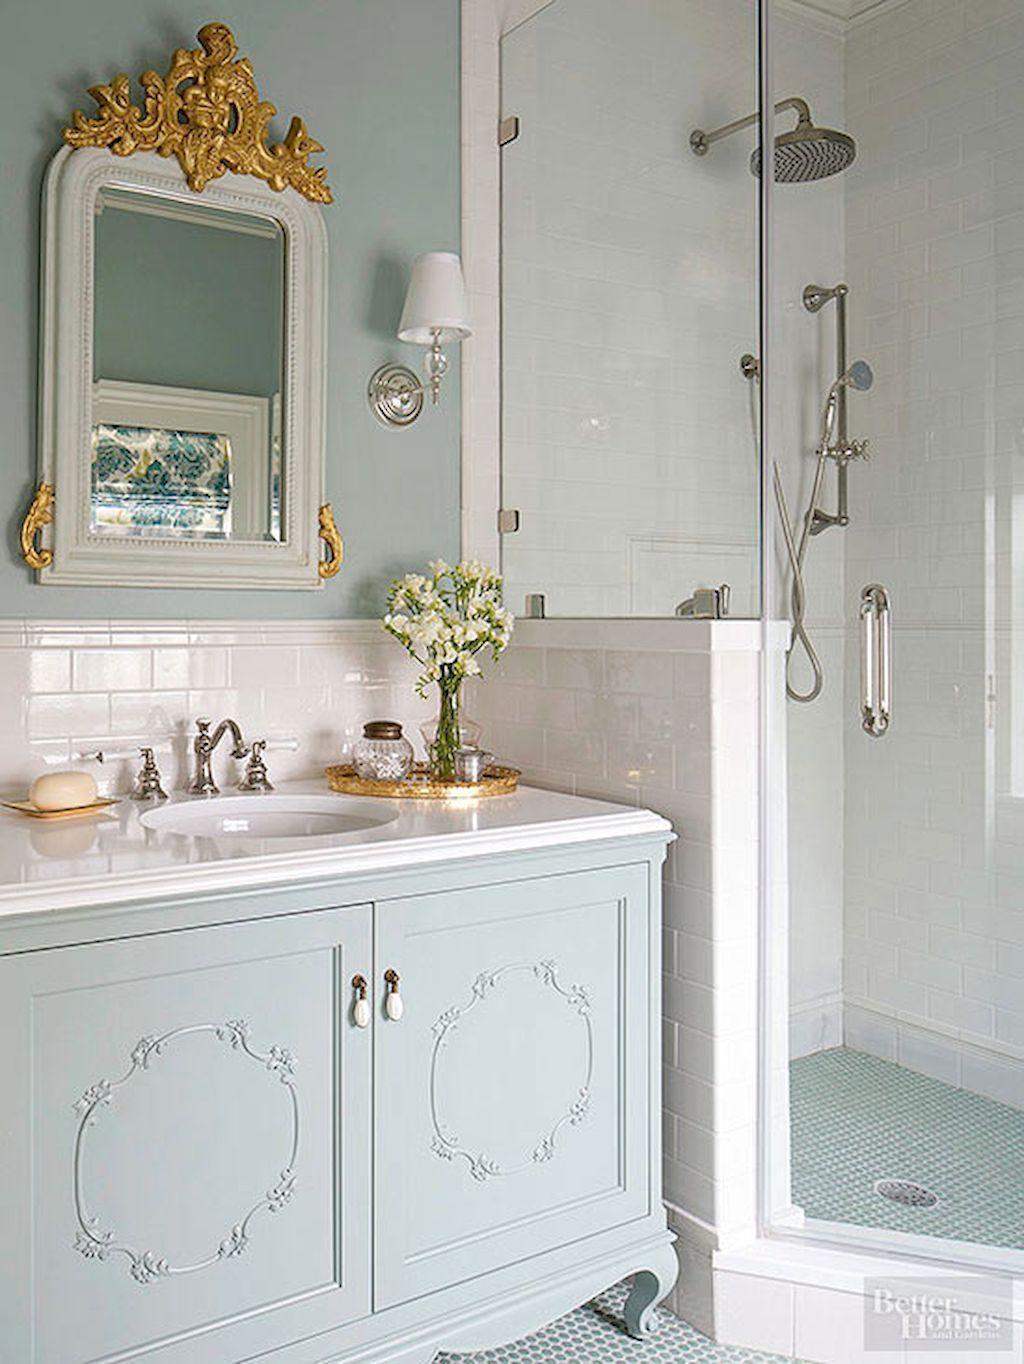 25 Stunning Shabby Chic Bathroom Designs That Will Adore You - 2A28B2F17549E3Eebf3E300Cad4Dabaa